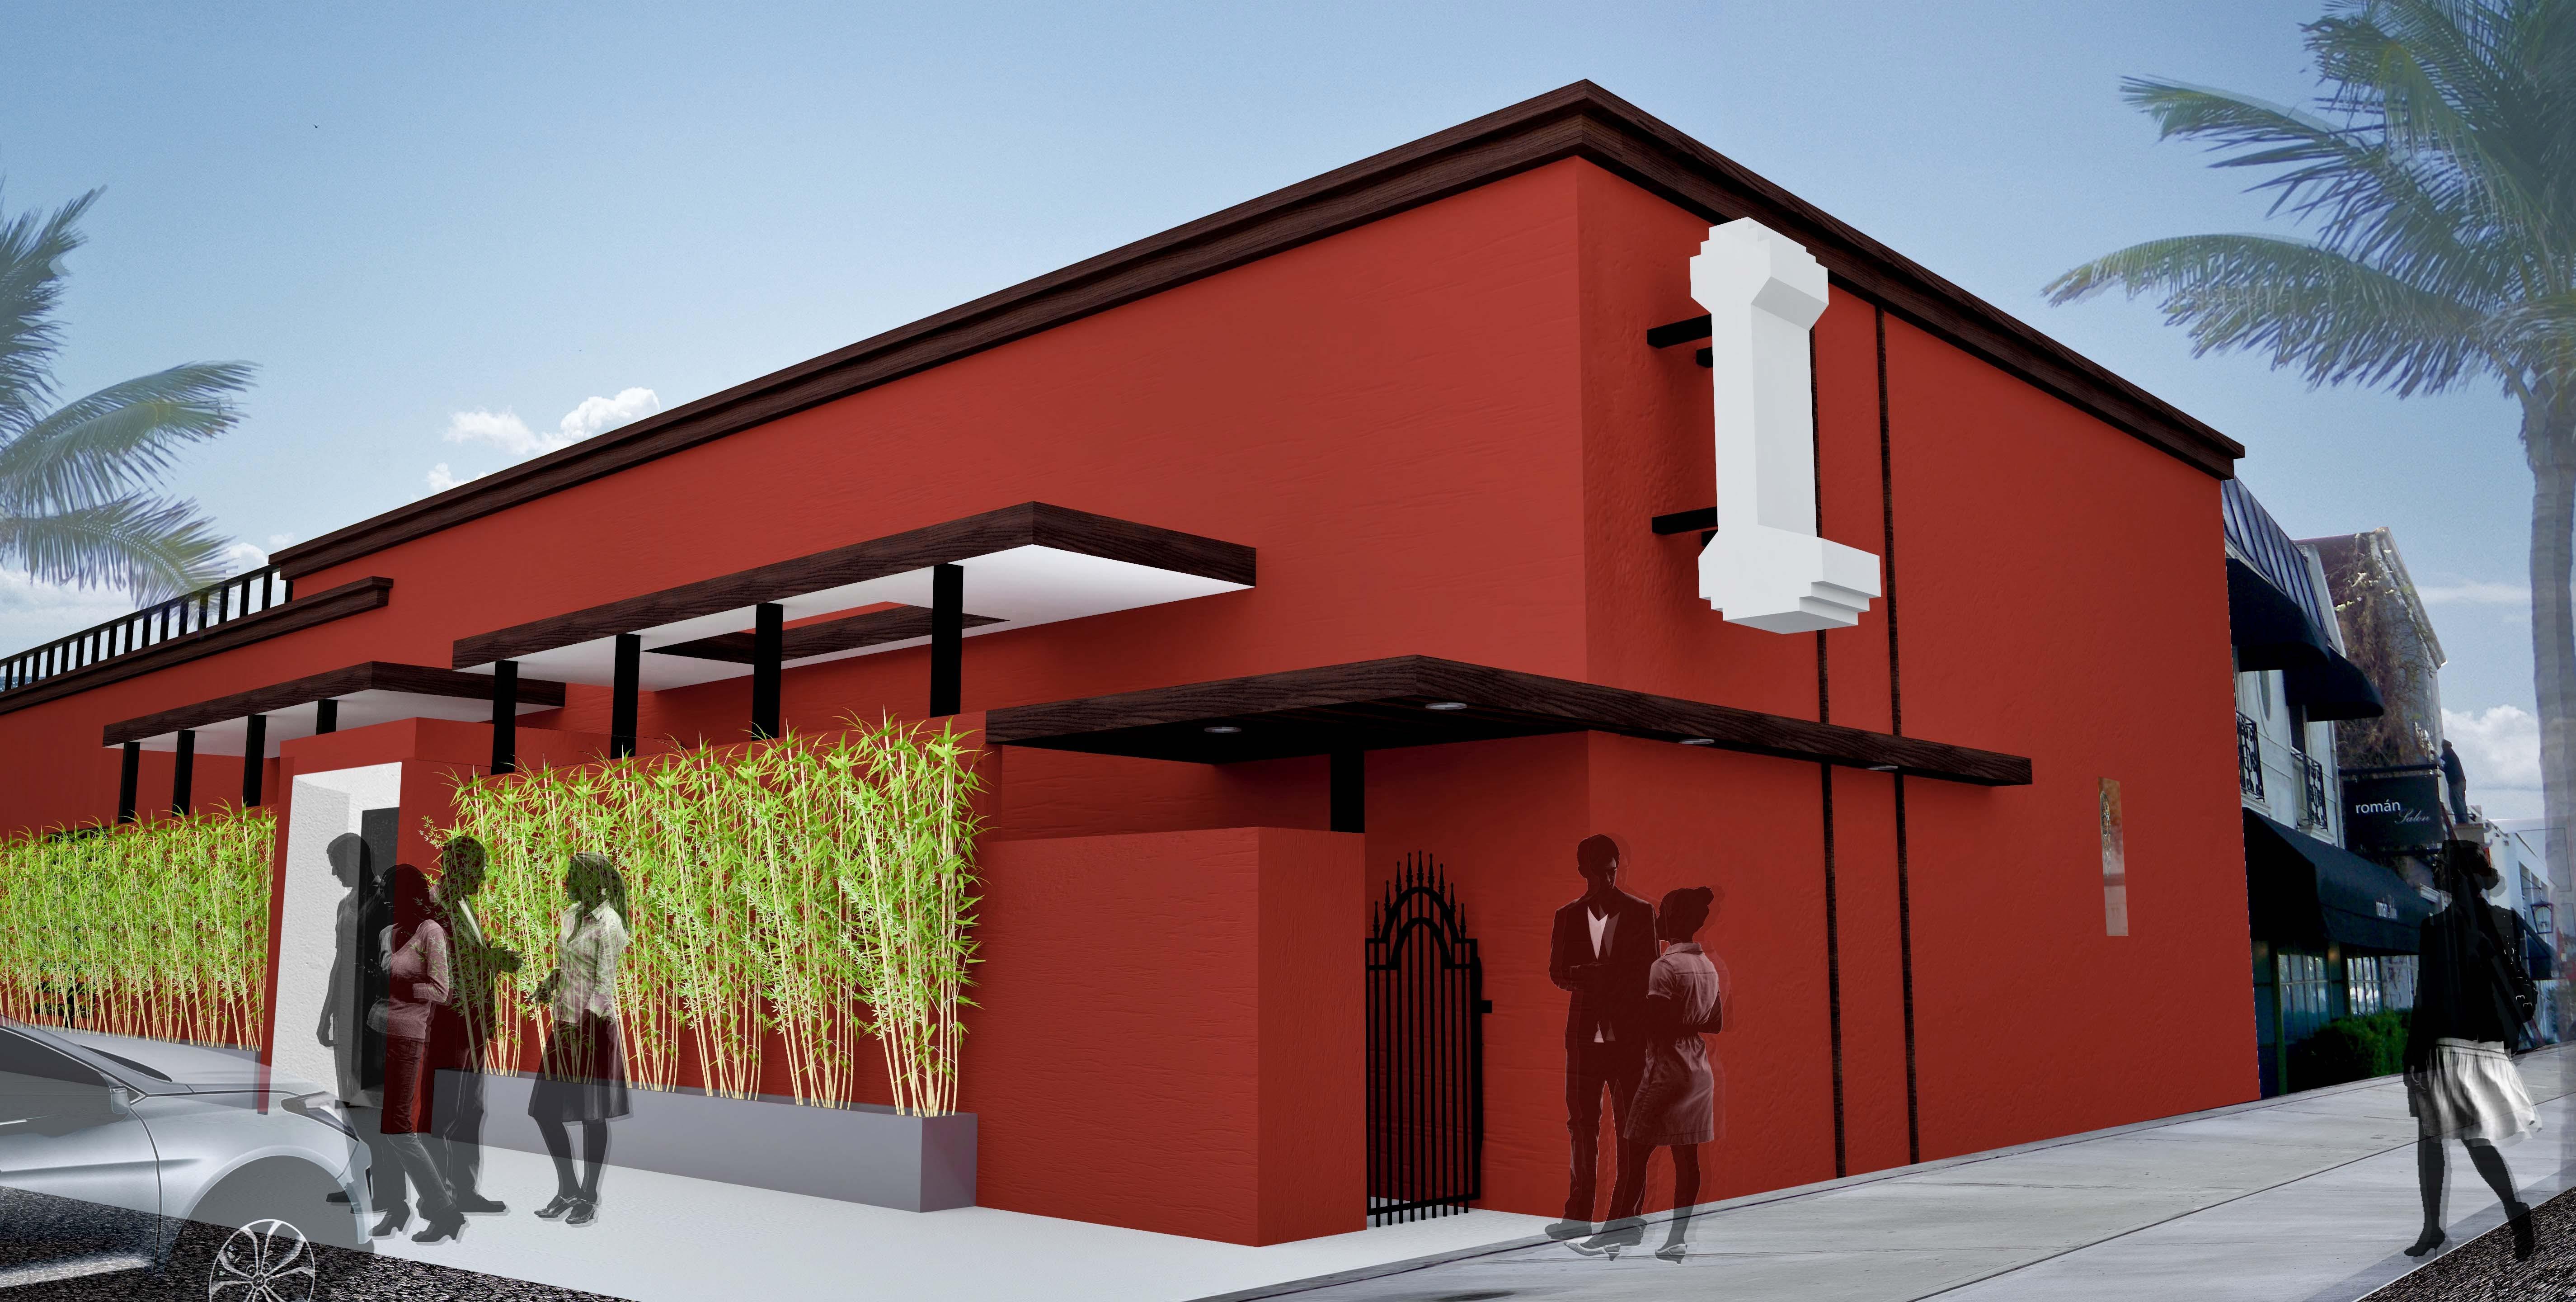 Hutchinson Restaurant Schematic Renderings Kristi Bailey Archinect